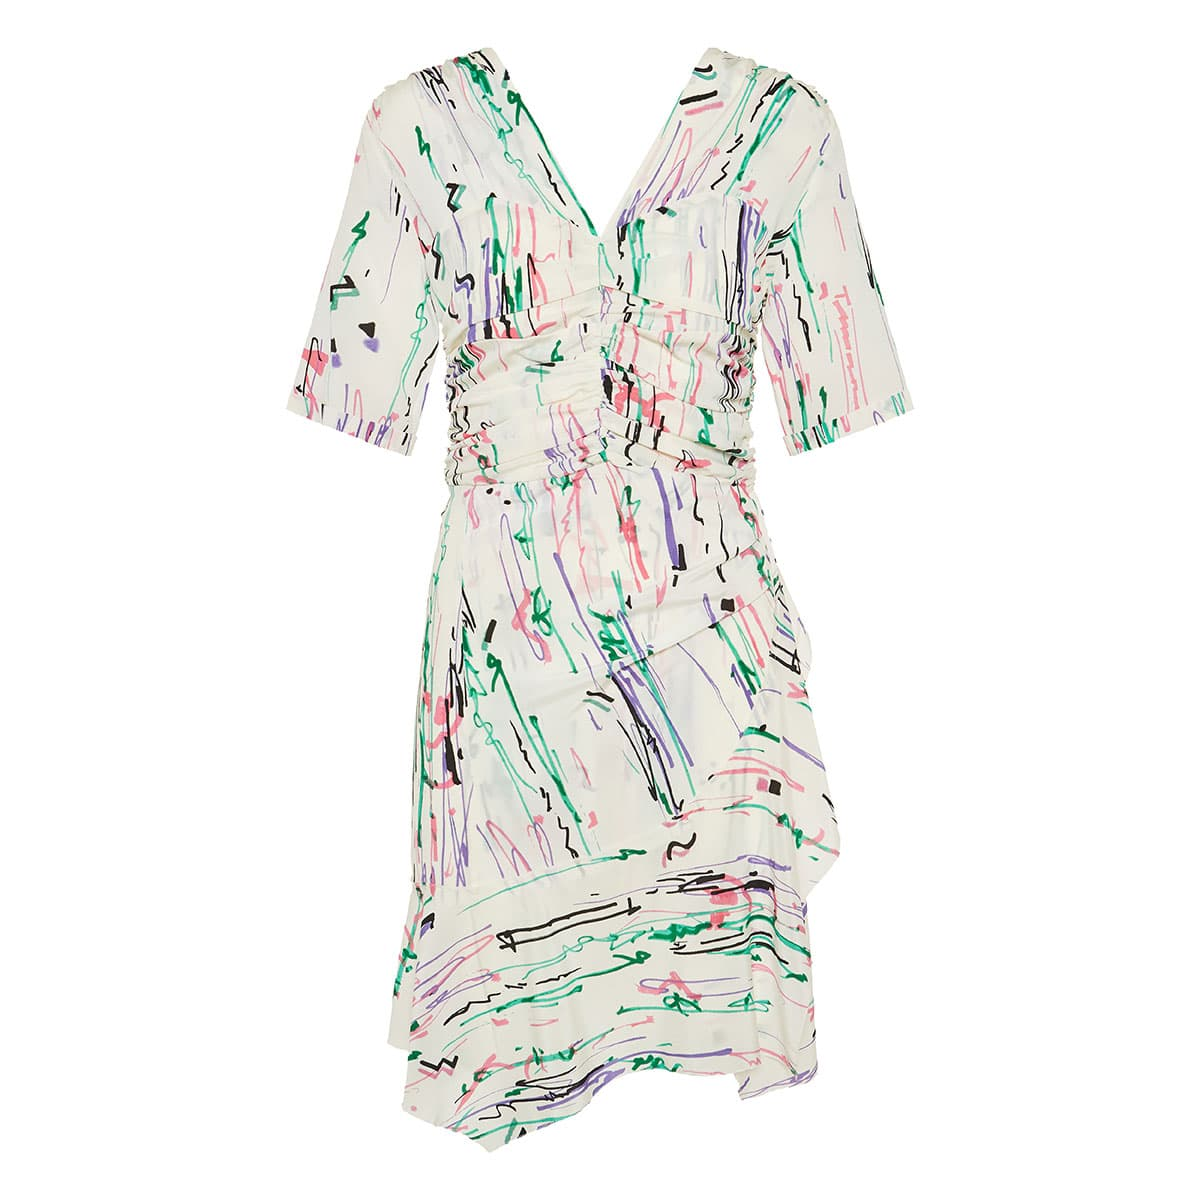 Arodie printed ruffled mini dress